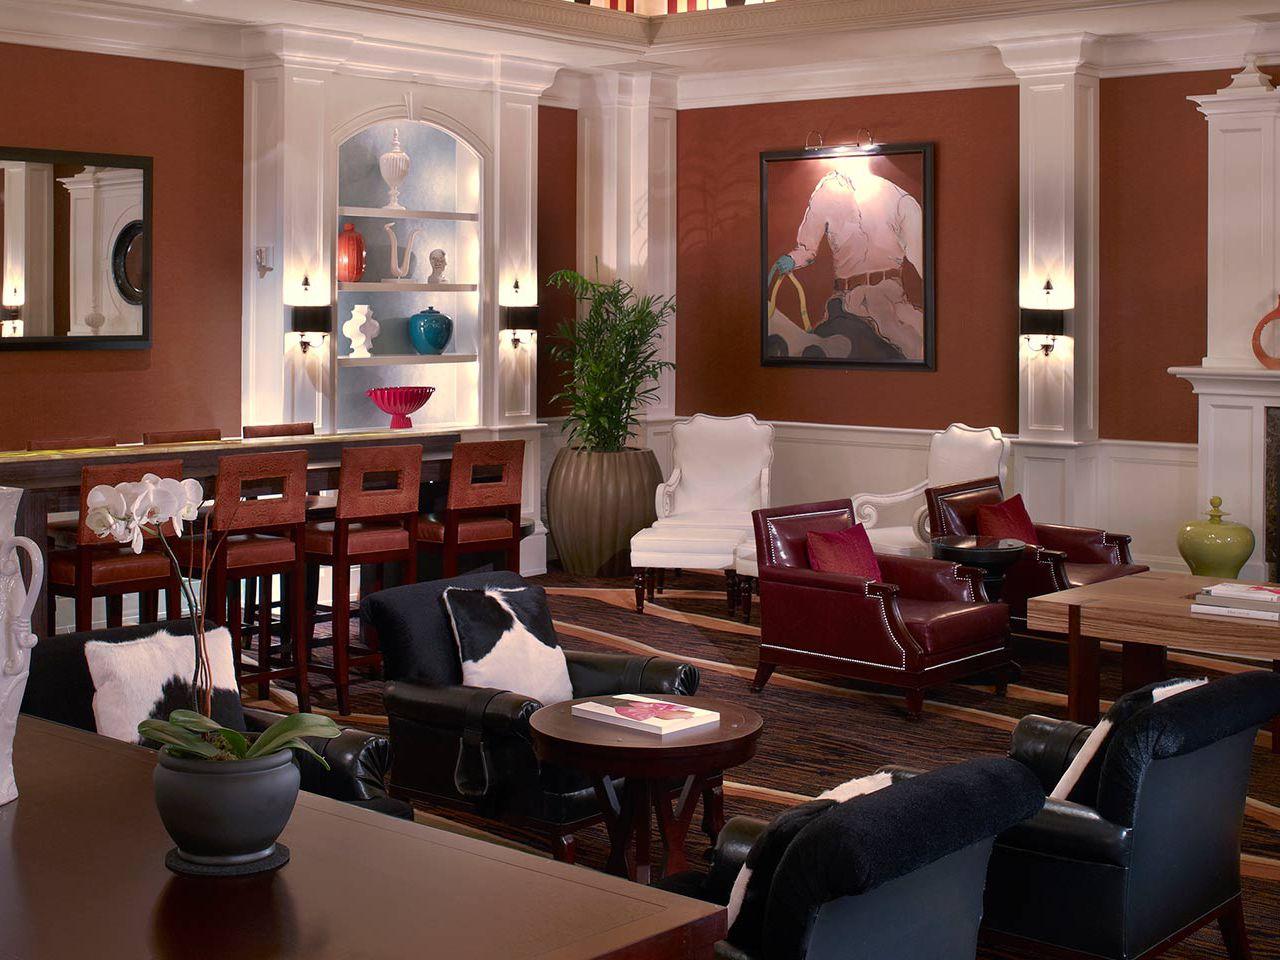 Denver's Best Gay-Friendly Hotels